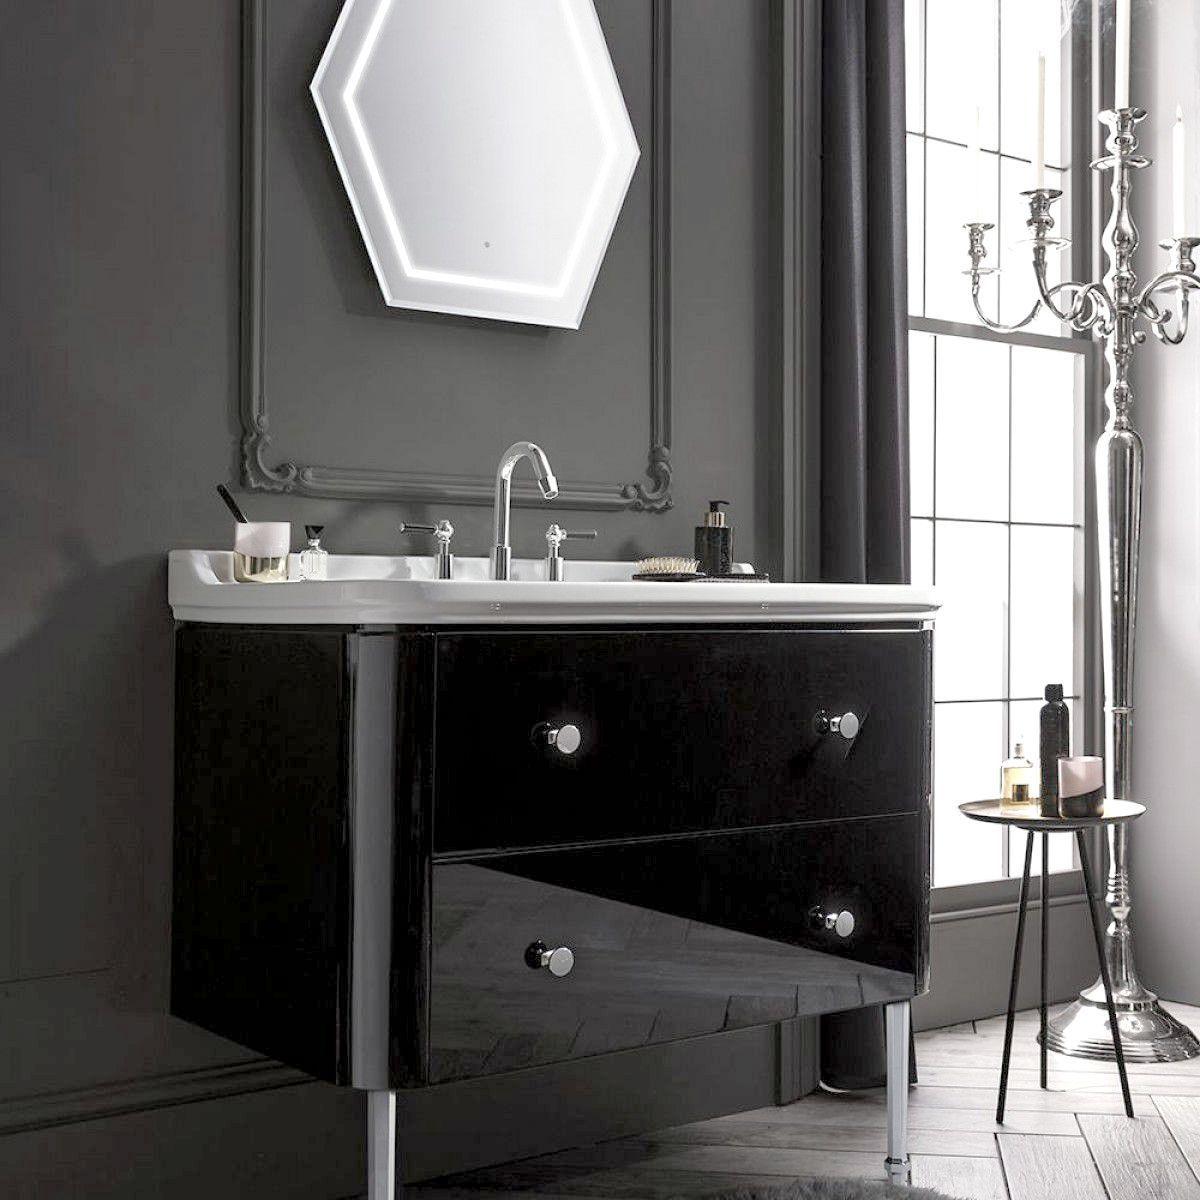 Crosswater (Bauhaus) Waldorf Vanity Unit with Legs Basin